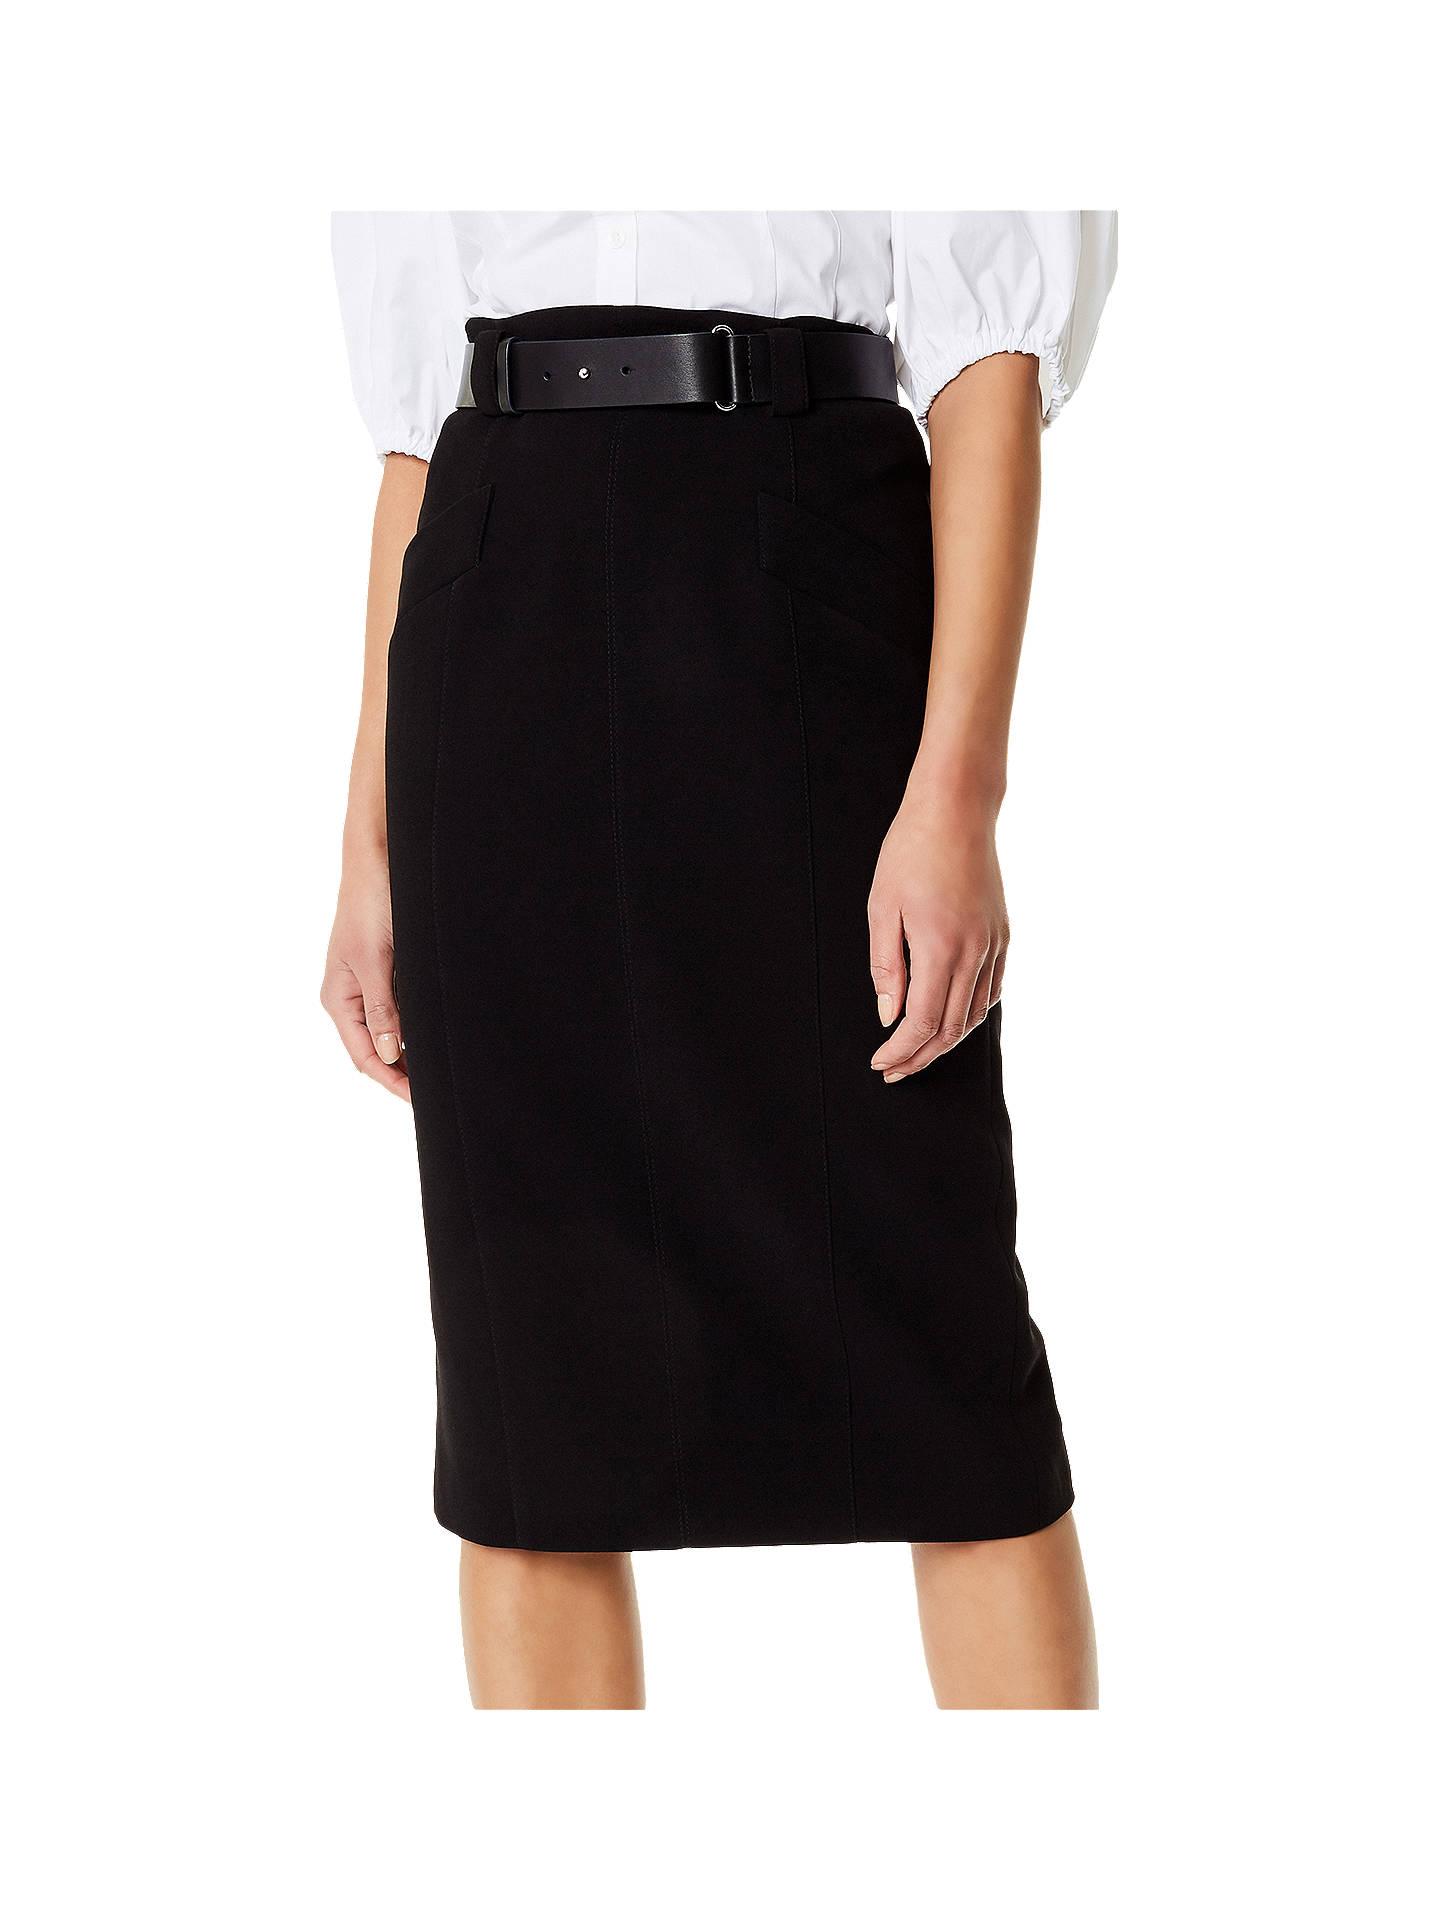 4b3e36f7f Buy Karen Millen Belt Pencil Skirt, Black, 6 Online at johnlewis.com ...